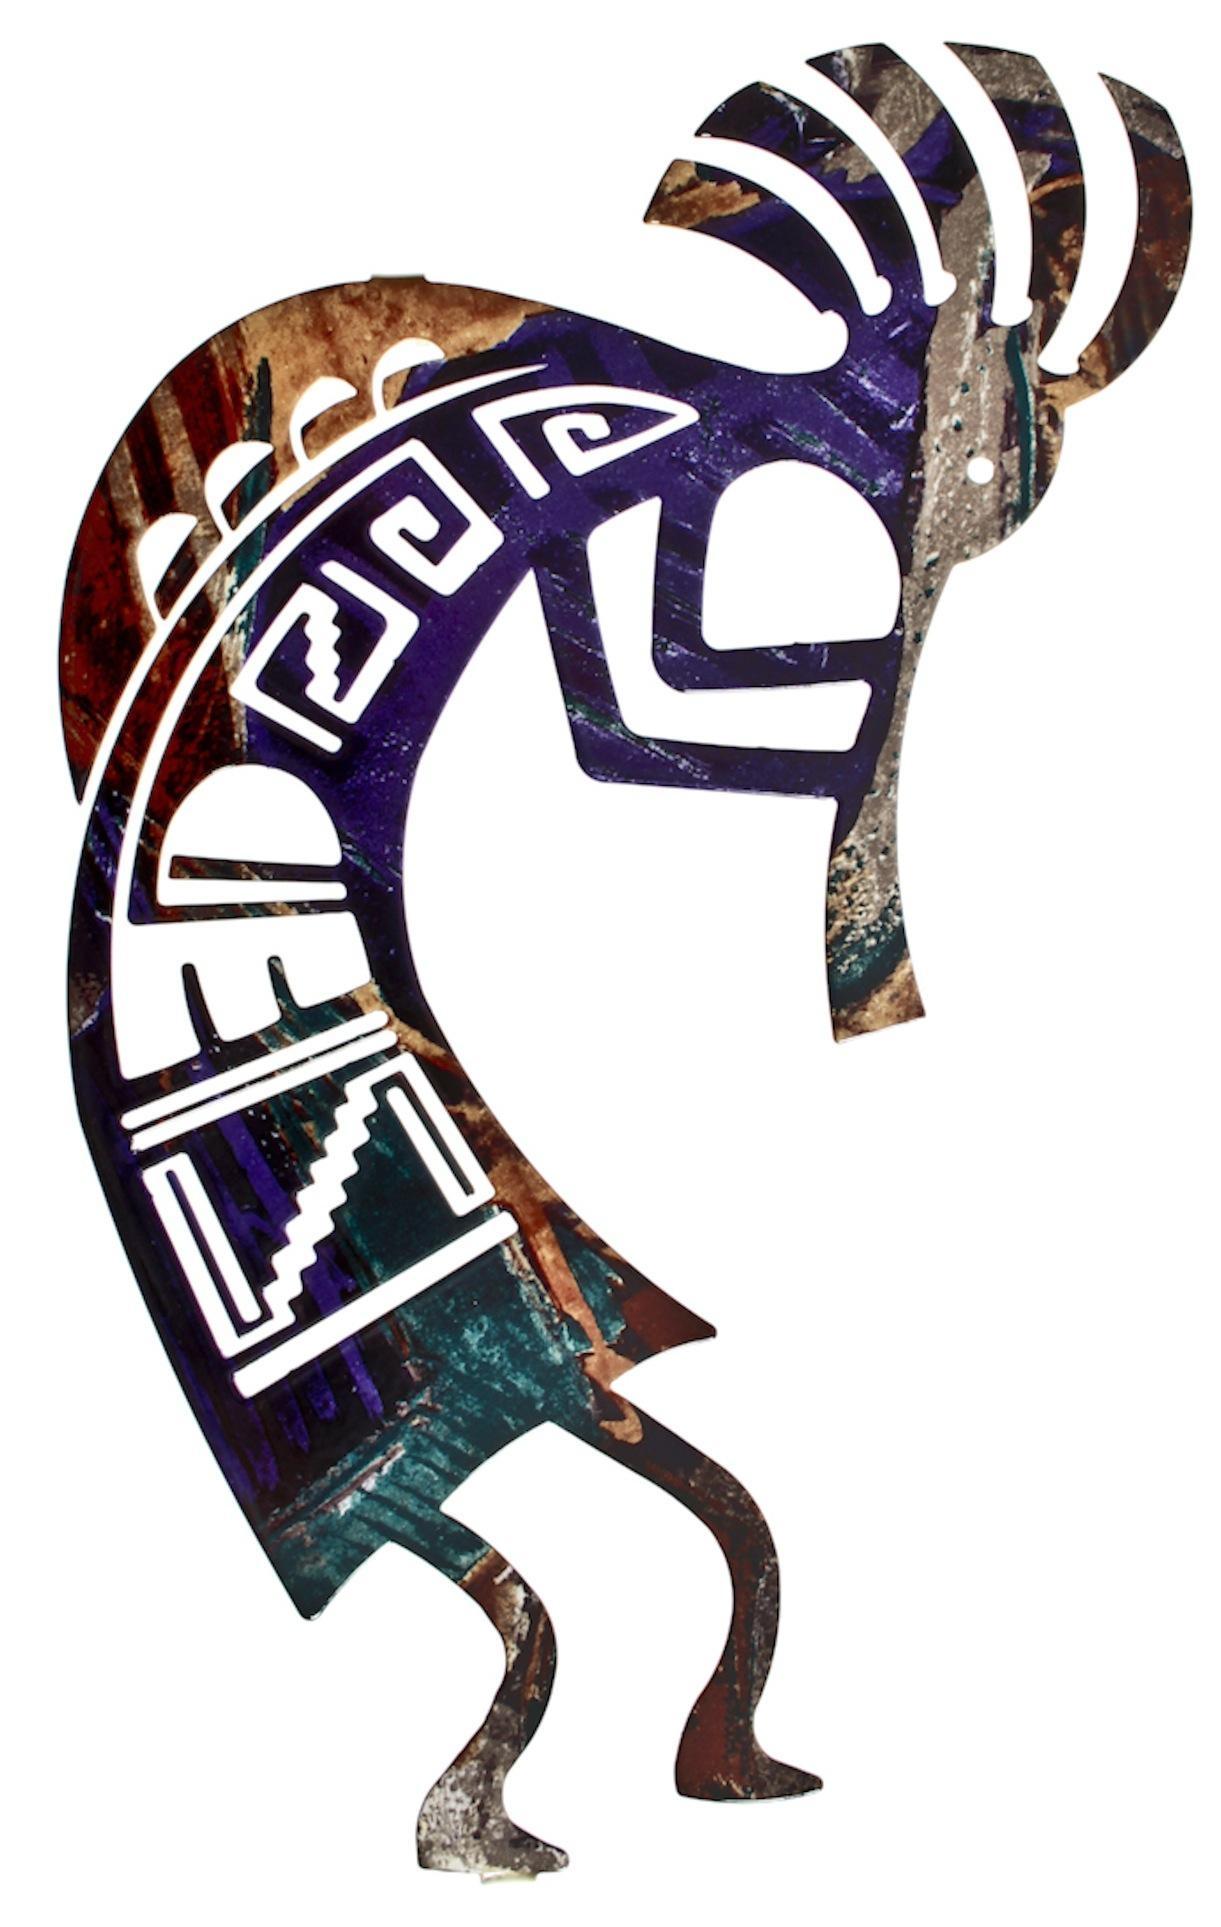 "12"" Hunched Over Kokopellibindrune Design| Modern Metal Wall Art Pertaining To Kokopelli Metal Wall Art (Image 1 of 20)"